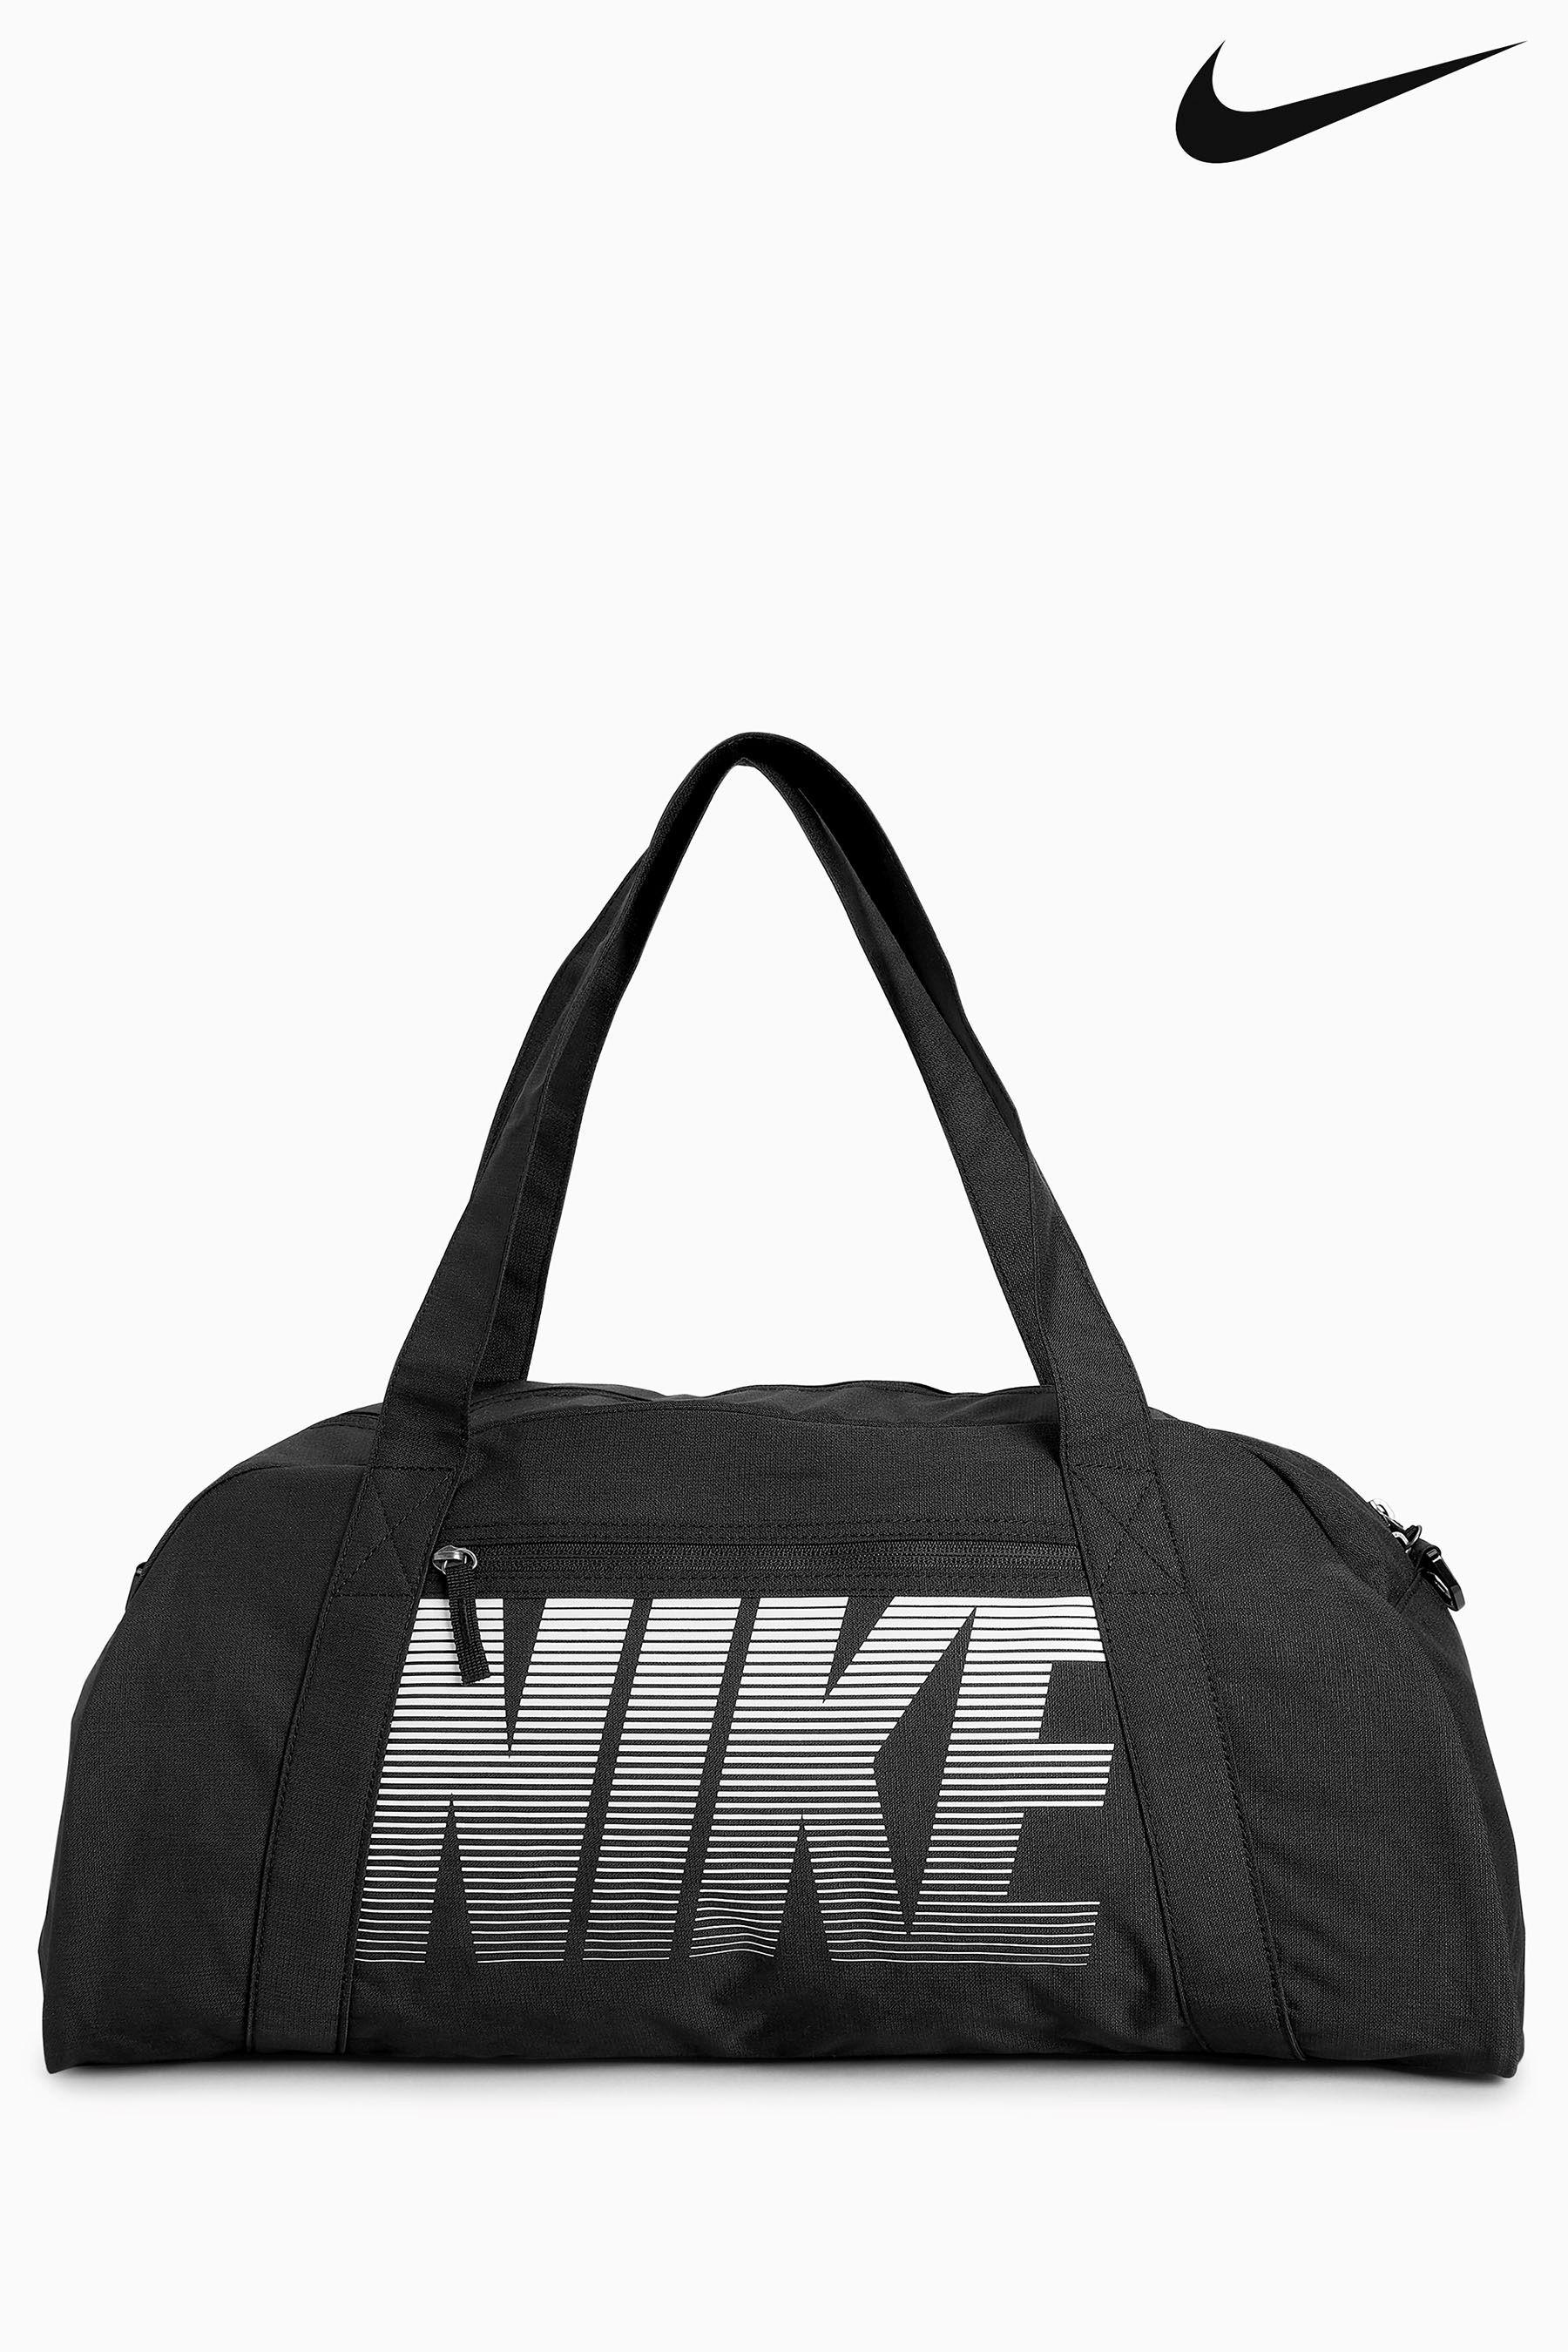 a3098652fb153e Womens Nike Gym Club Duffle Bag - Black in 2019 | Products | Bags ...